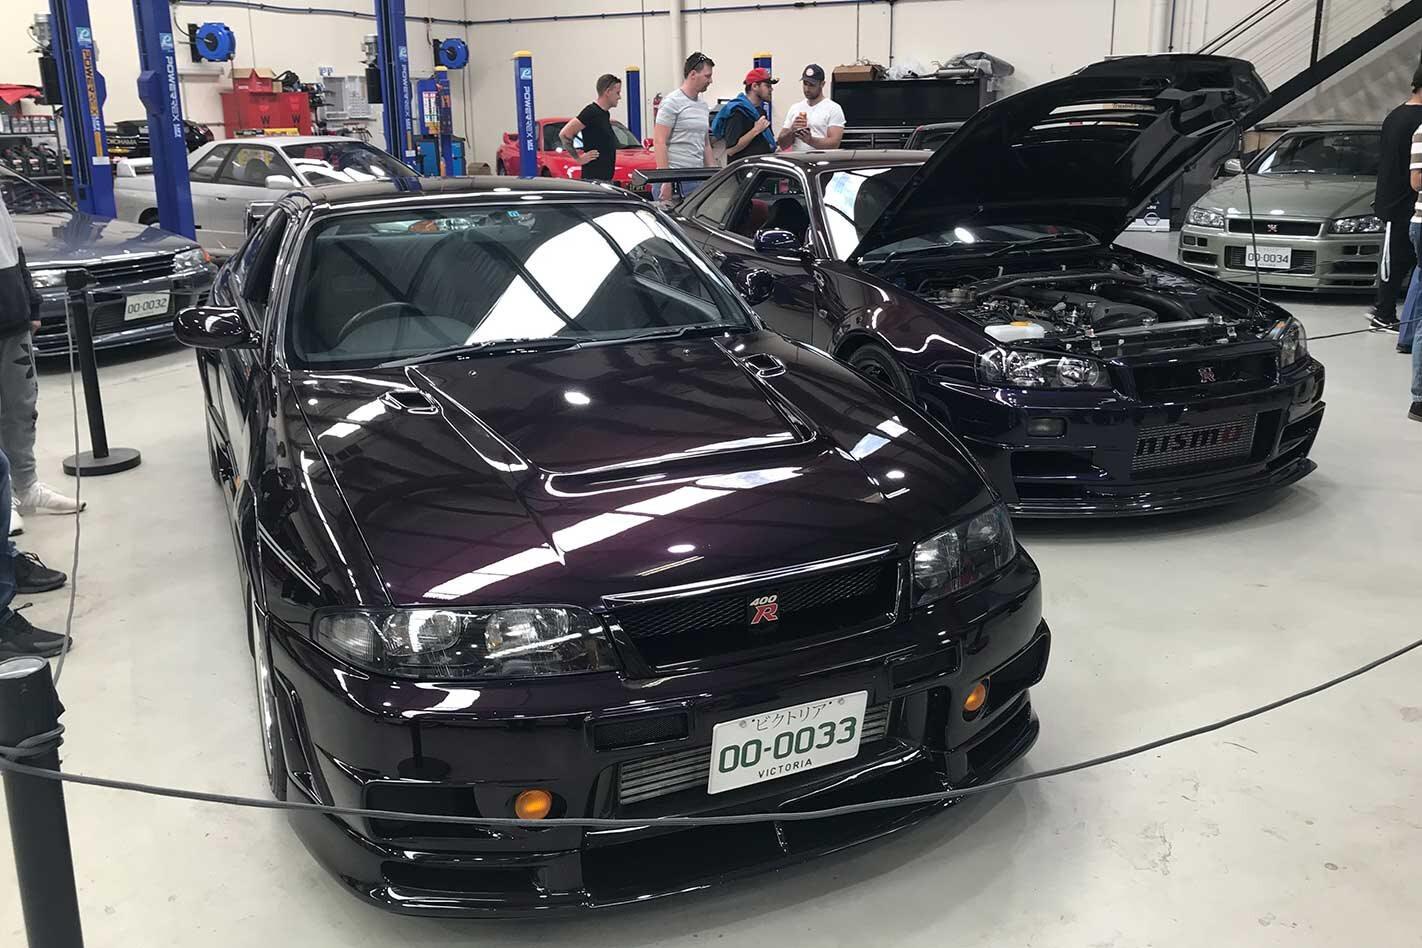 Worlds Best Nissan GT-R Collection